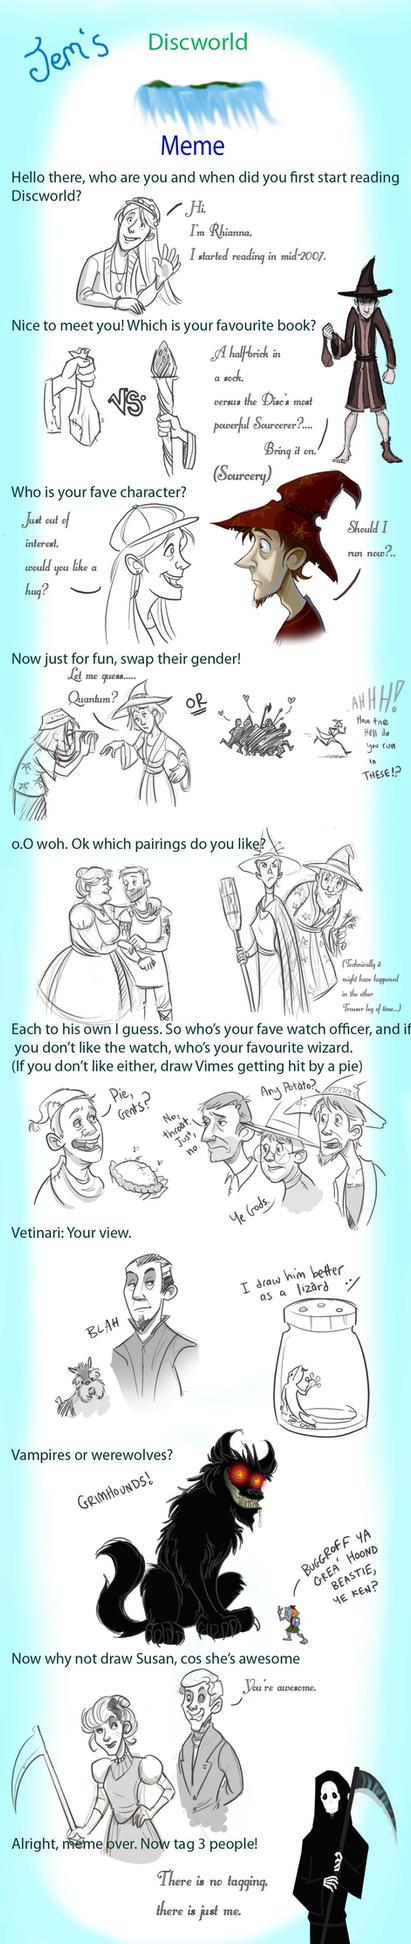 Discworld meme by Jem by rhianimated